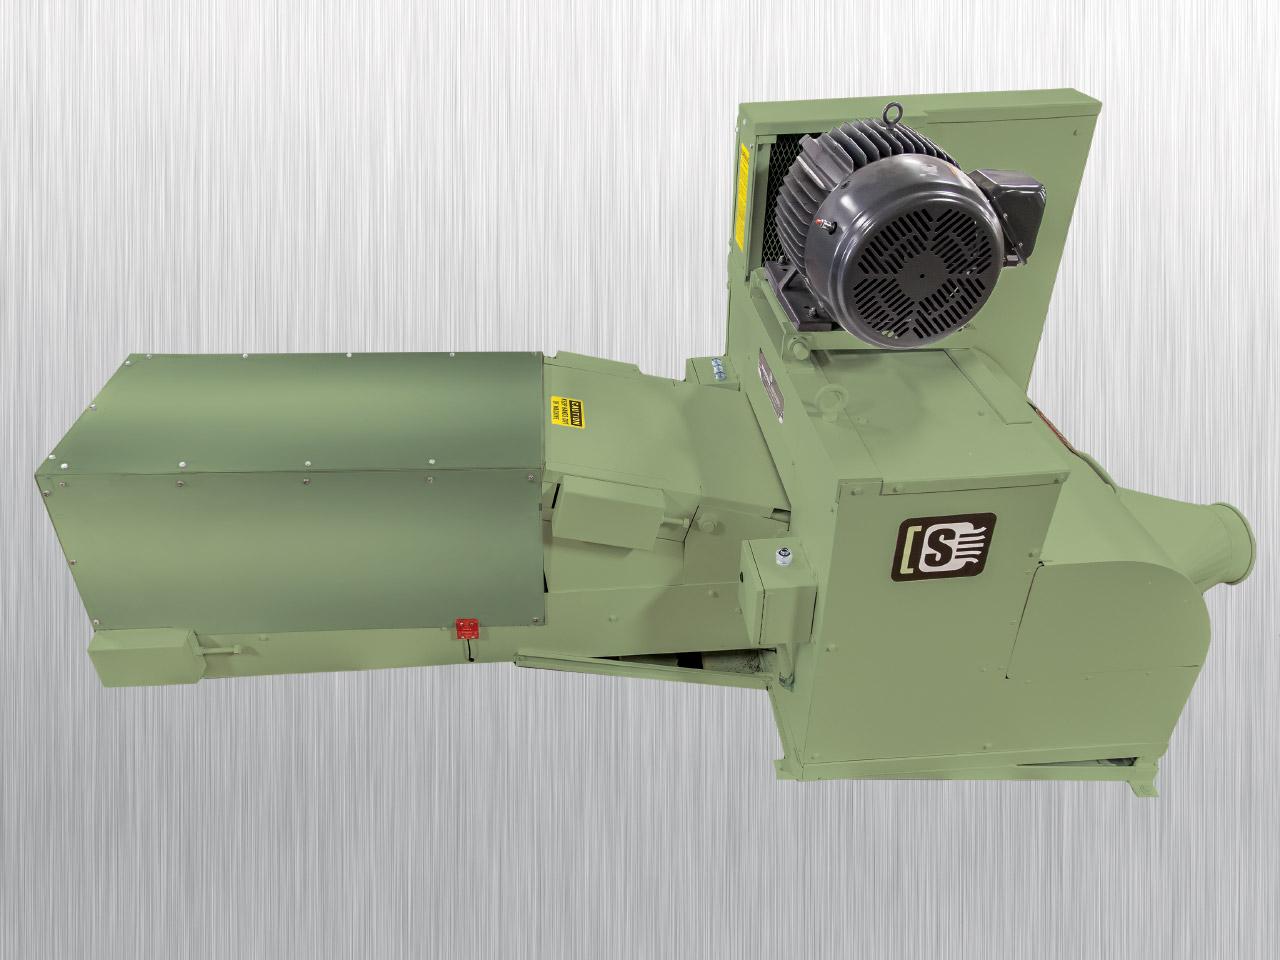 Tissue Log Shredder 20-OD   Side View   Industrial Shredders